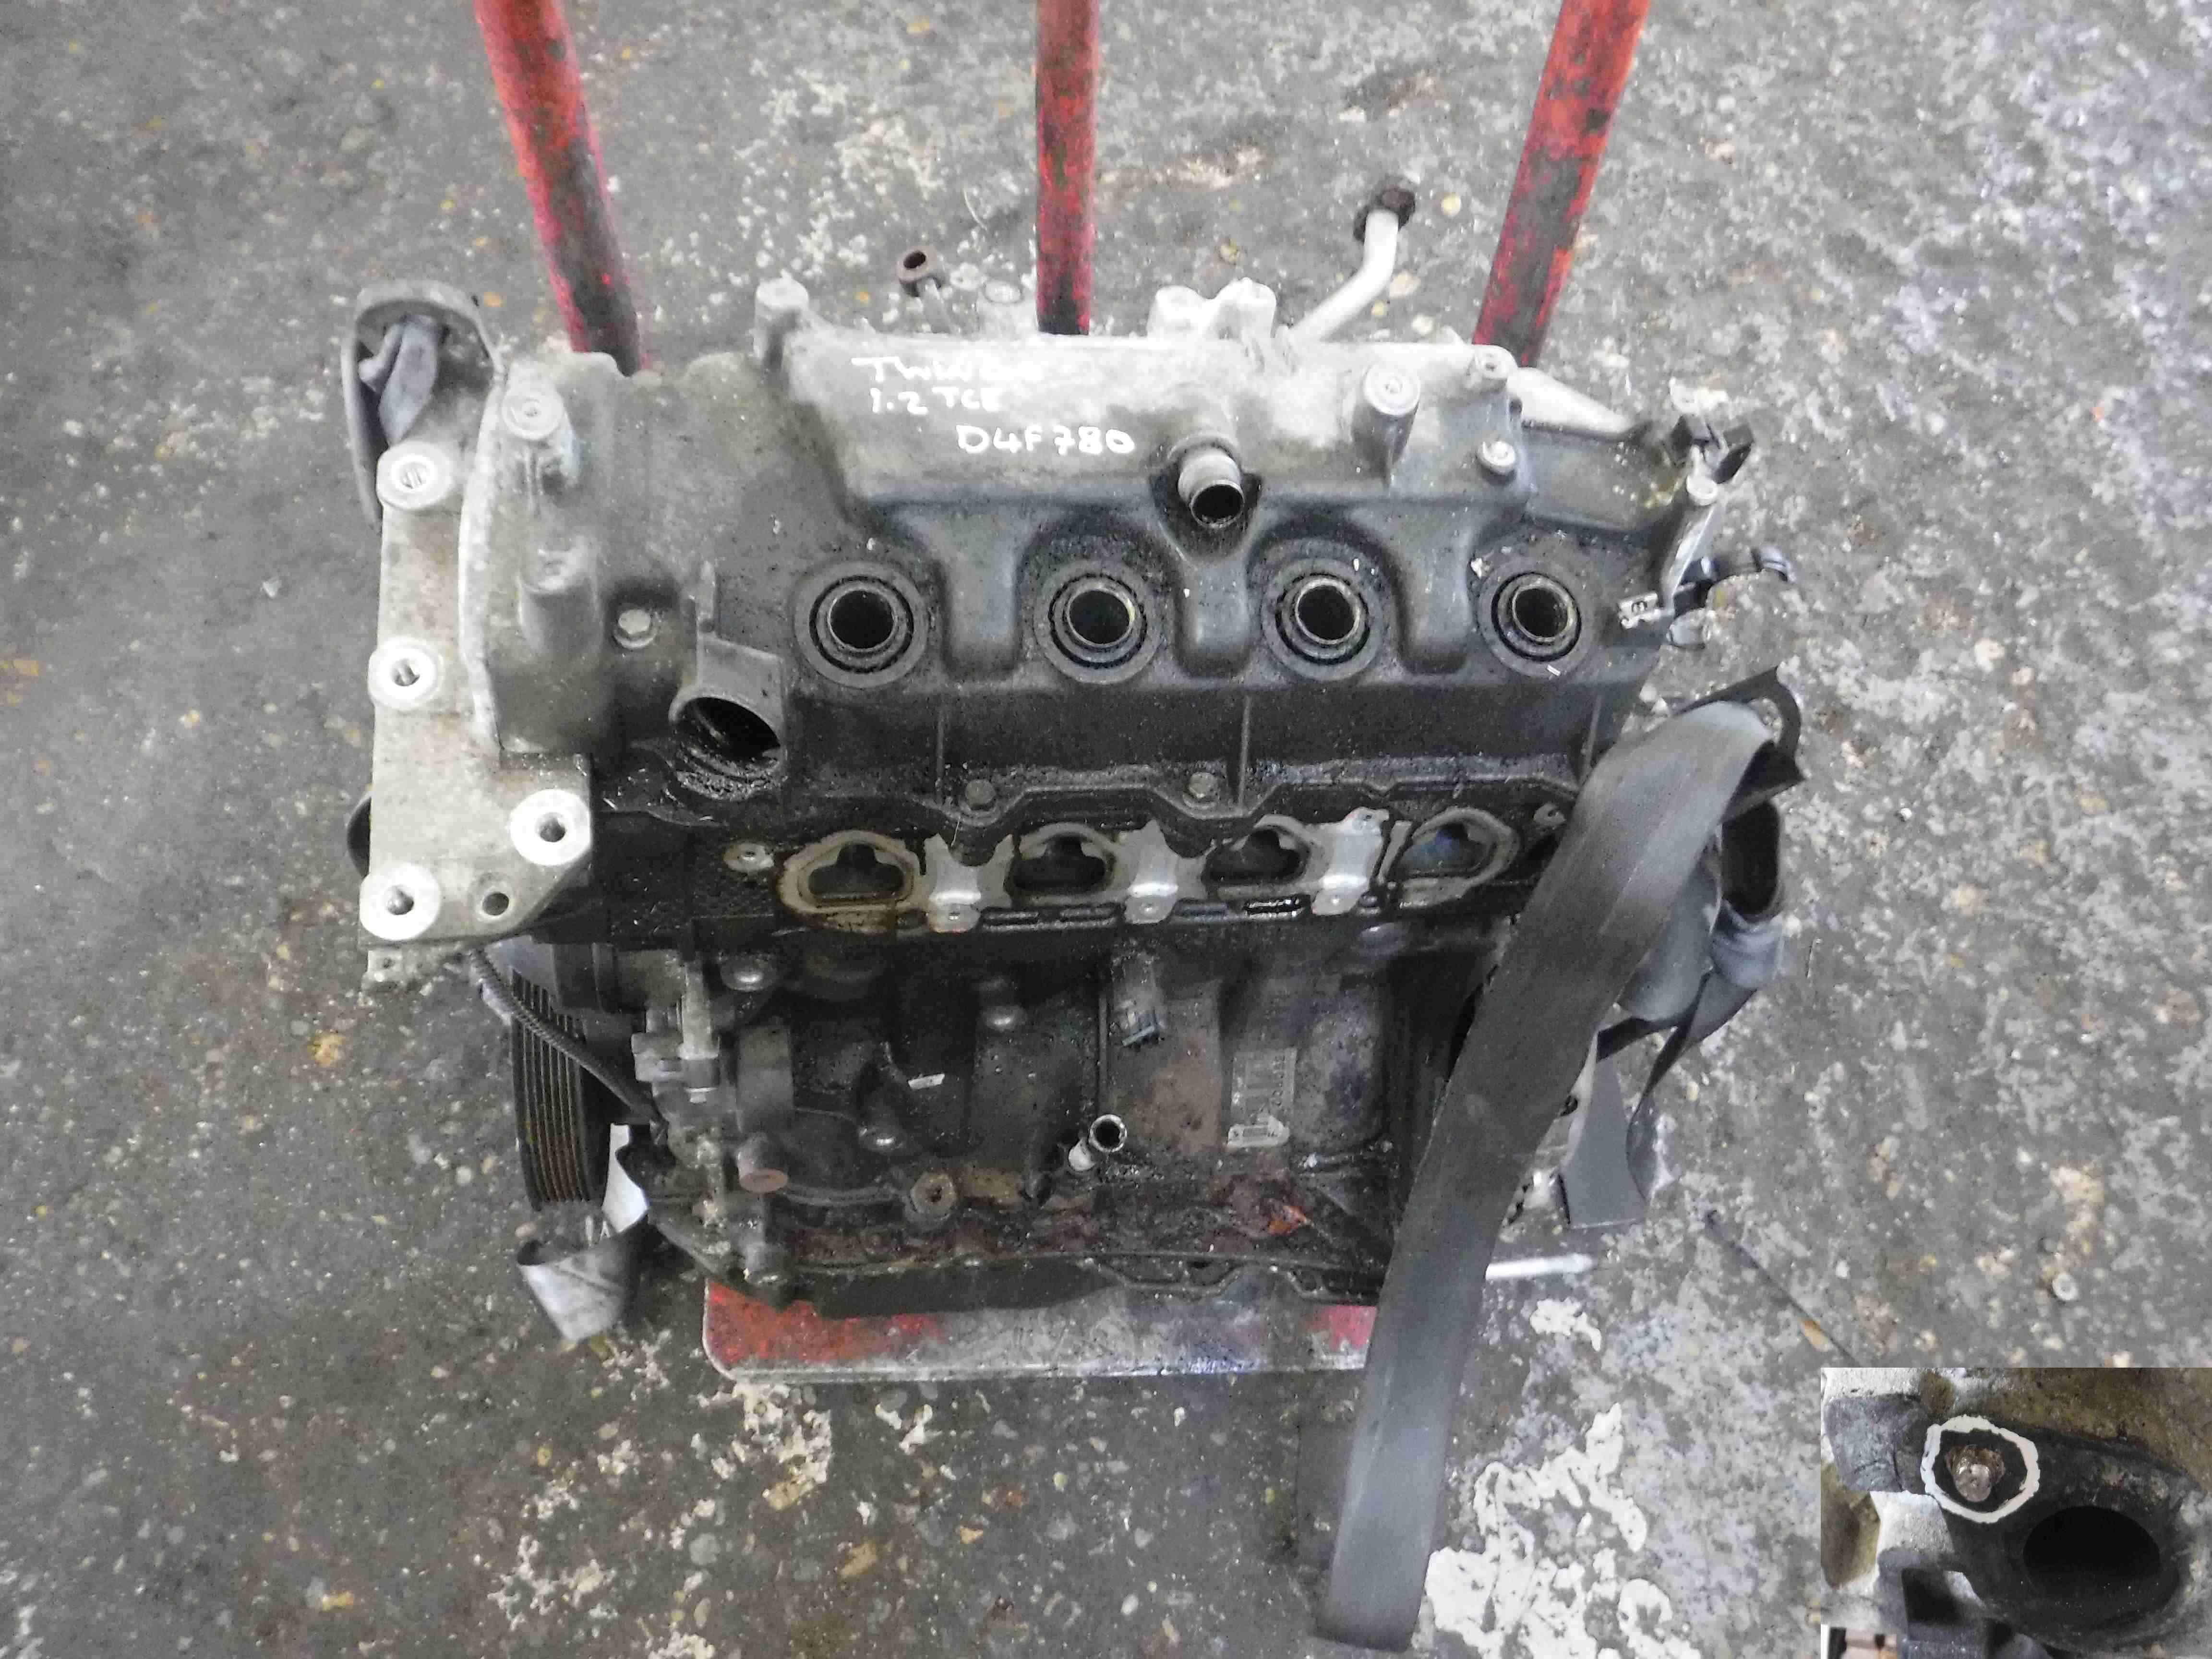 Renault Twingo 2007-2011 1.2 TCE Turbo Engine D4F 780 *3 Months Warranty* d4f780